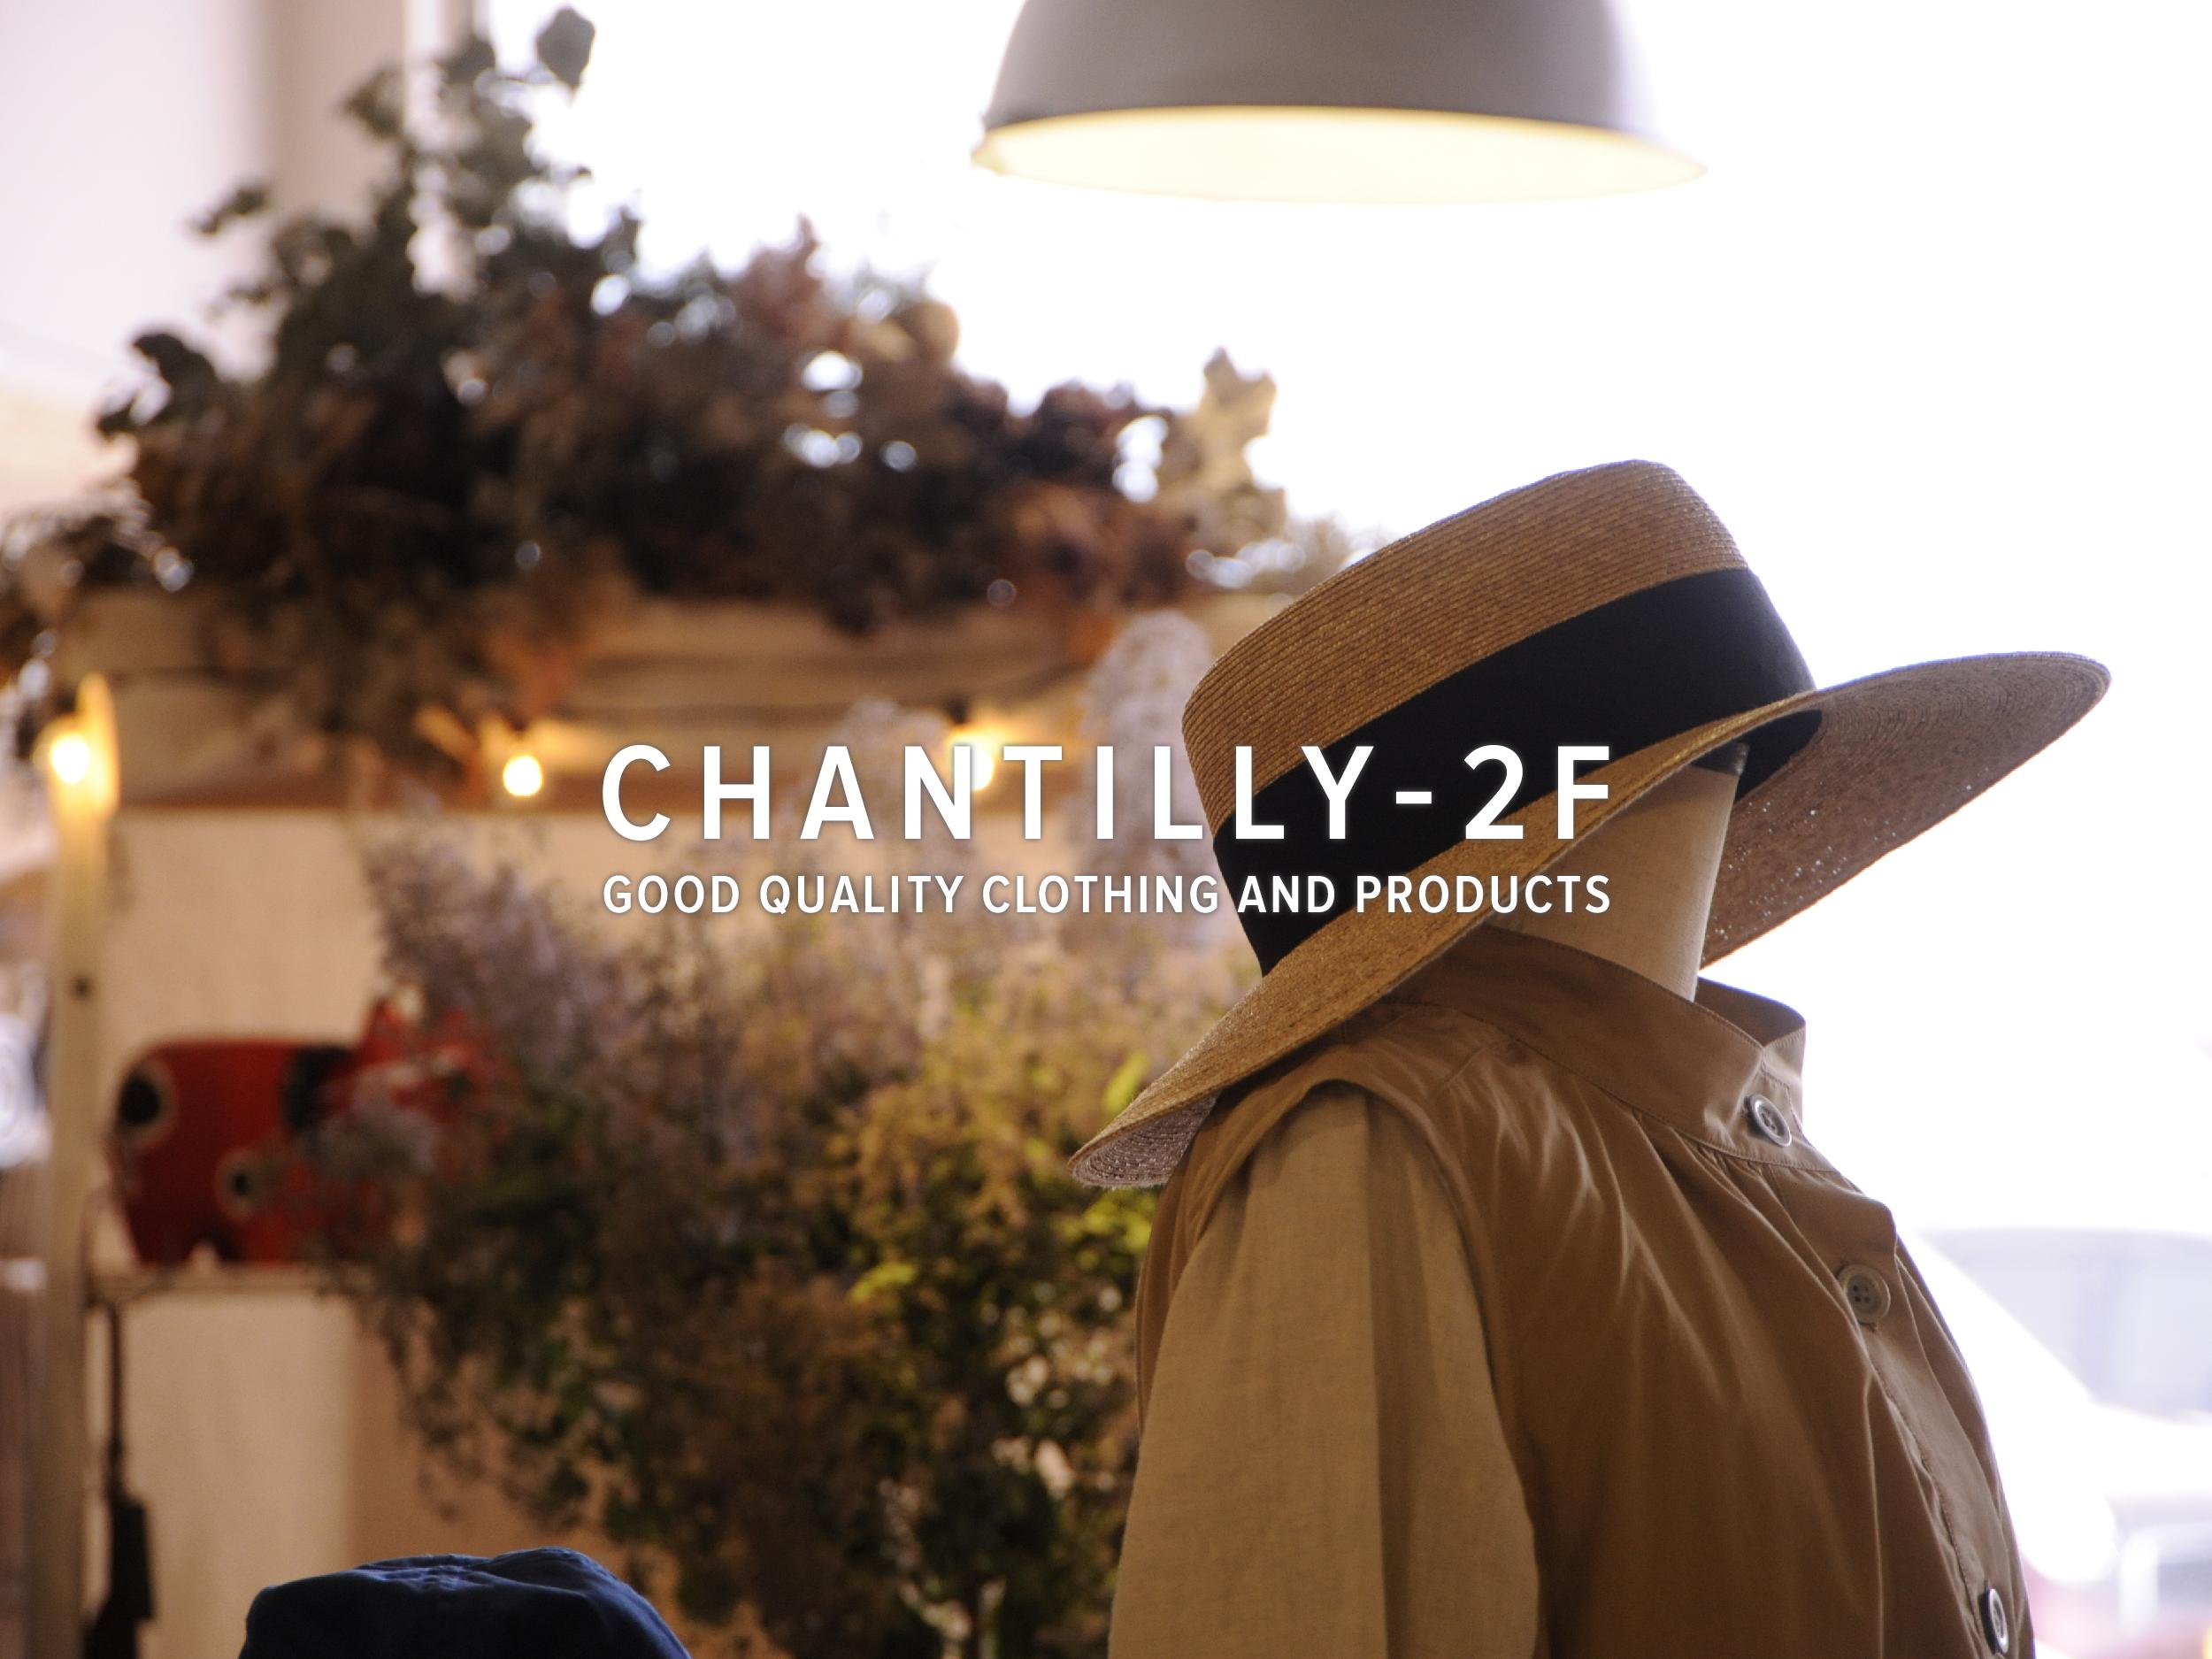 chantilly-2f-01.jpg